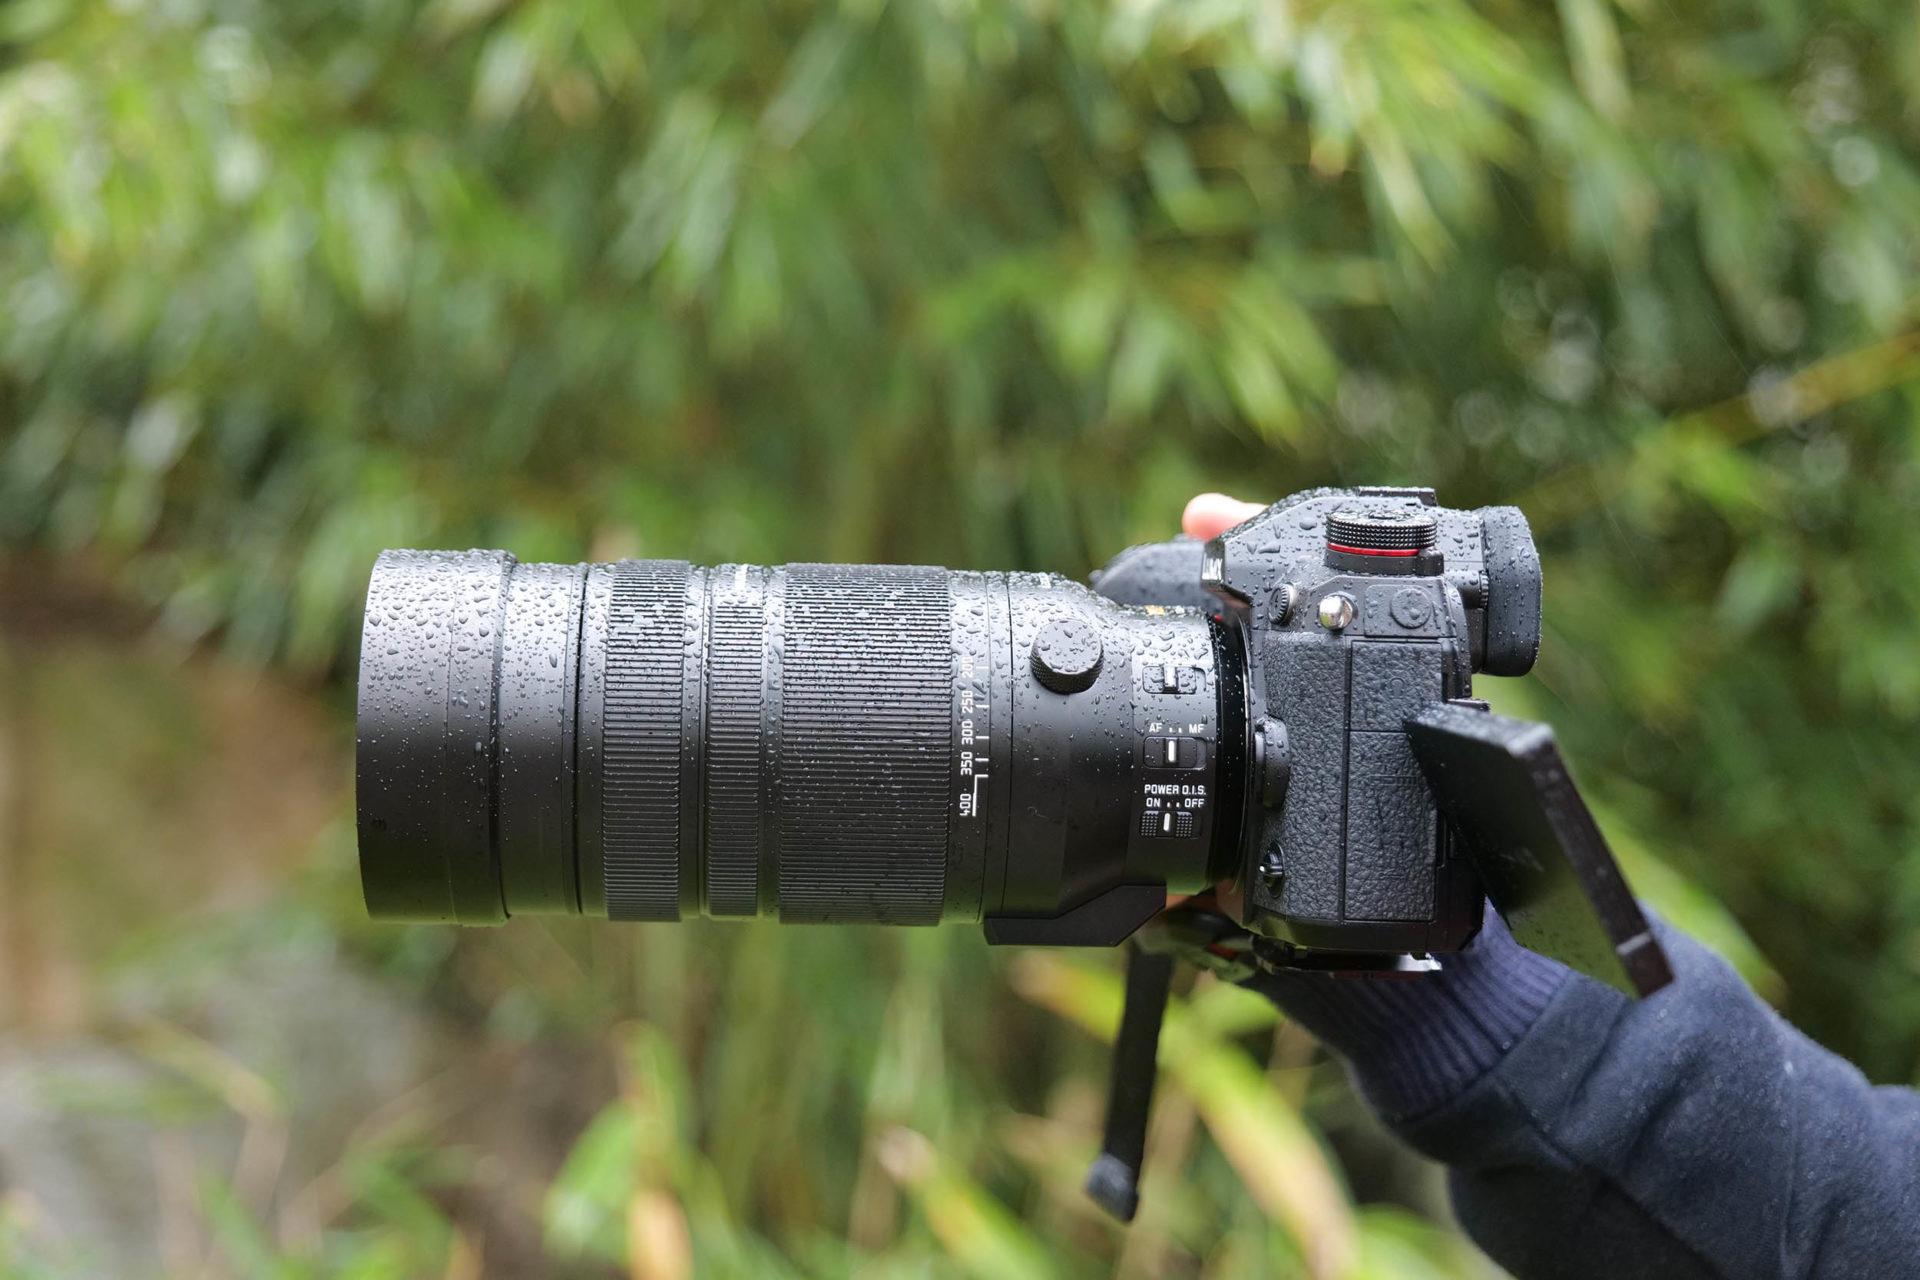 Panasonic Leica 100-400 mm f4.0-6.7